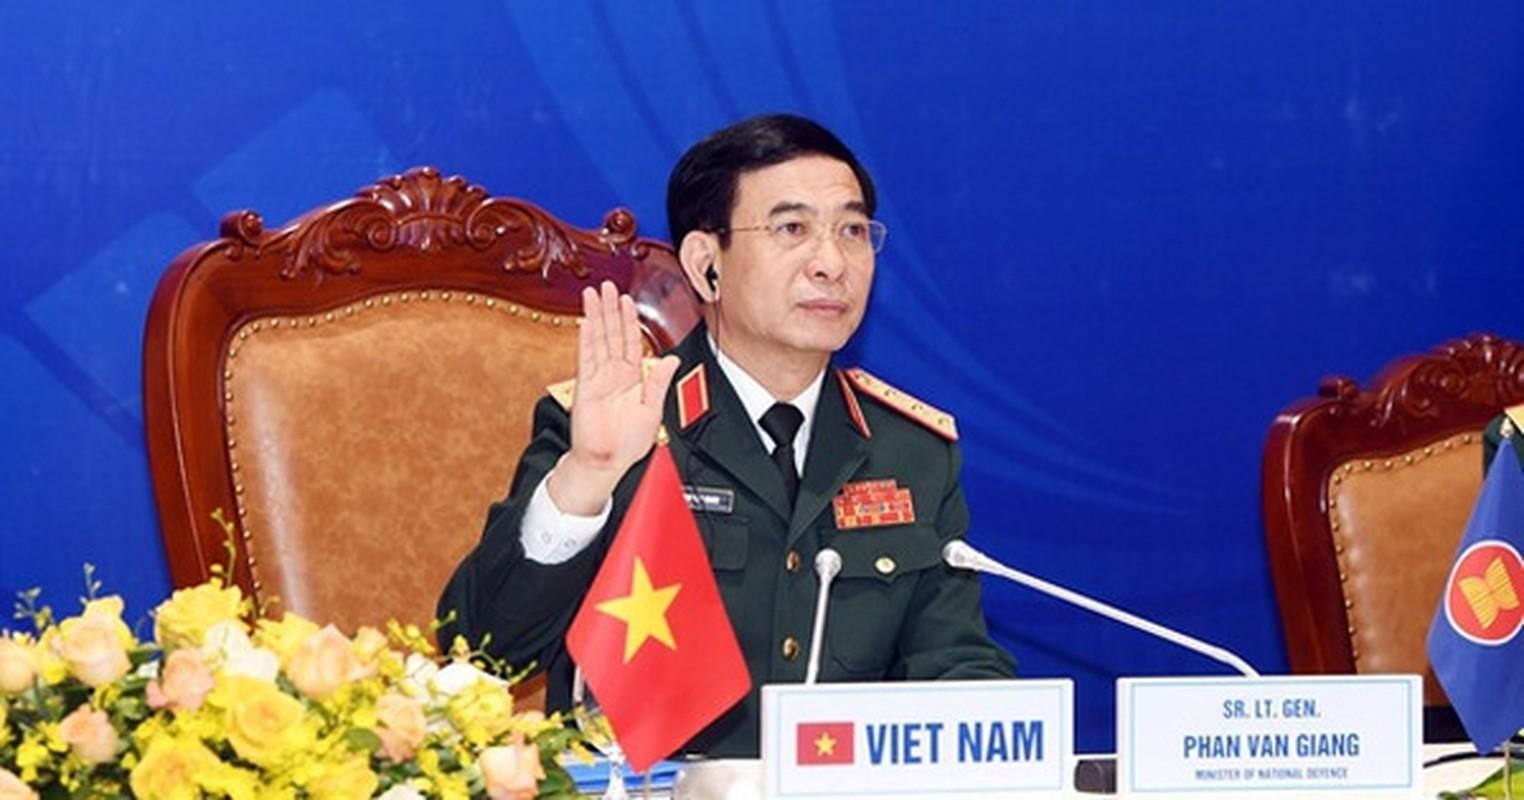 Bo truong Pham Van Giang duoc thang quan ham Dai tuong-Hinh-7